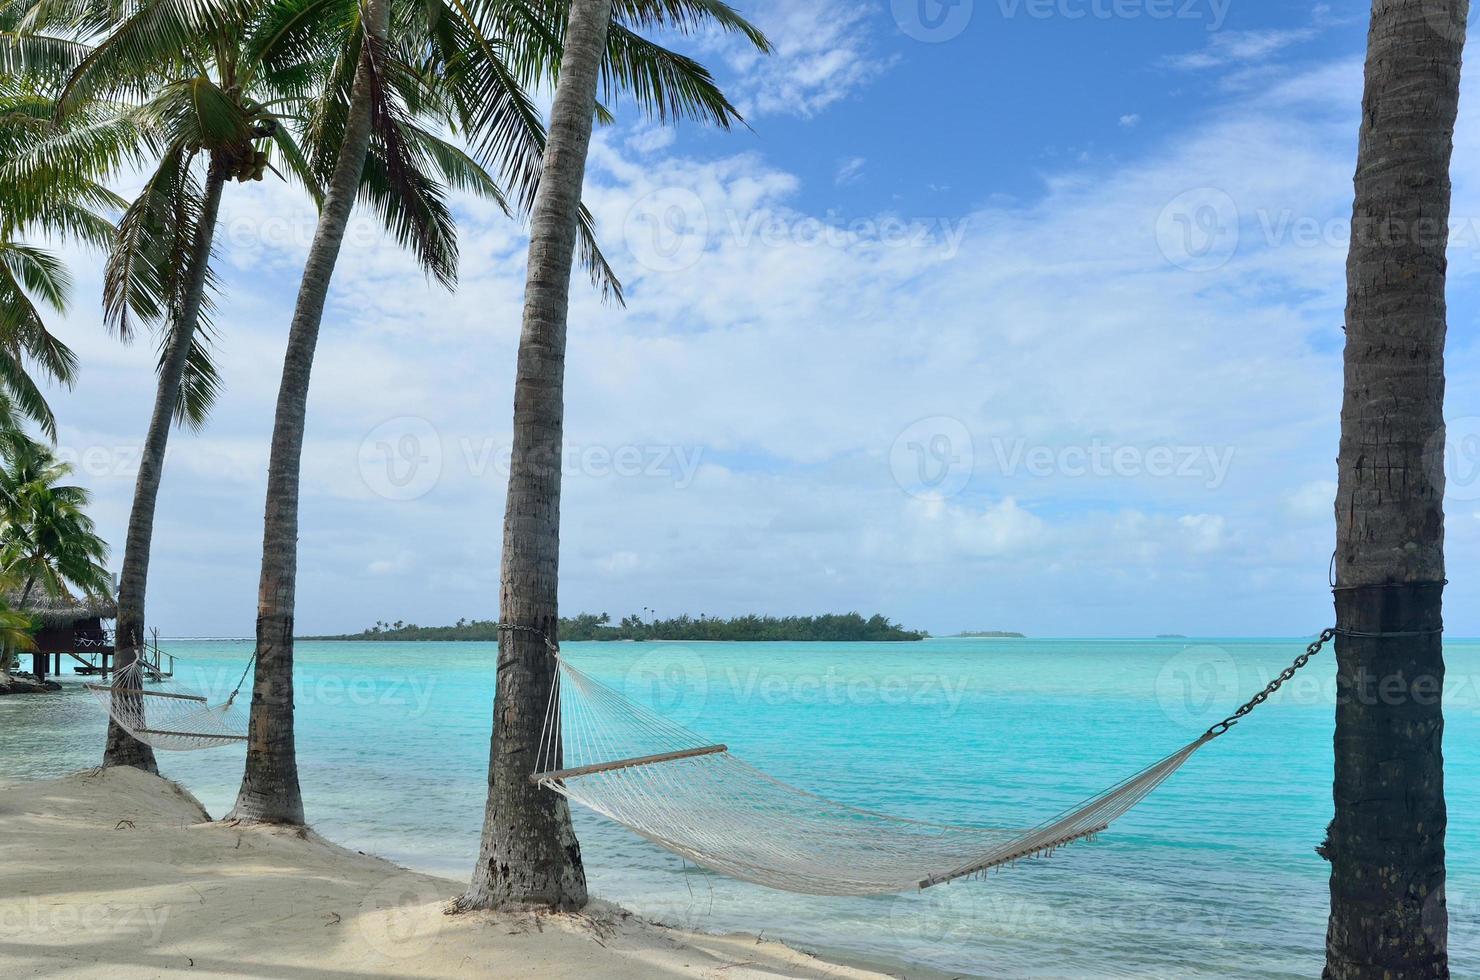 Hammock on Tropical Island photo